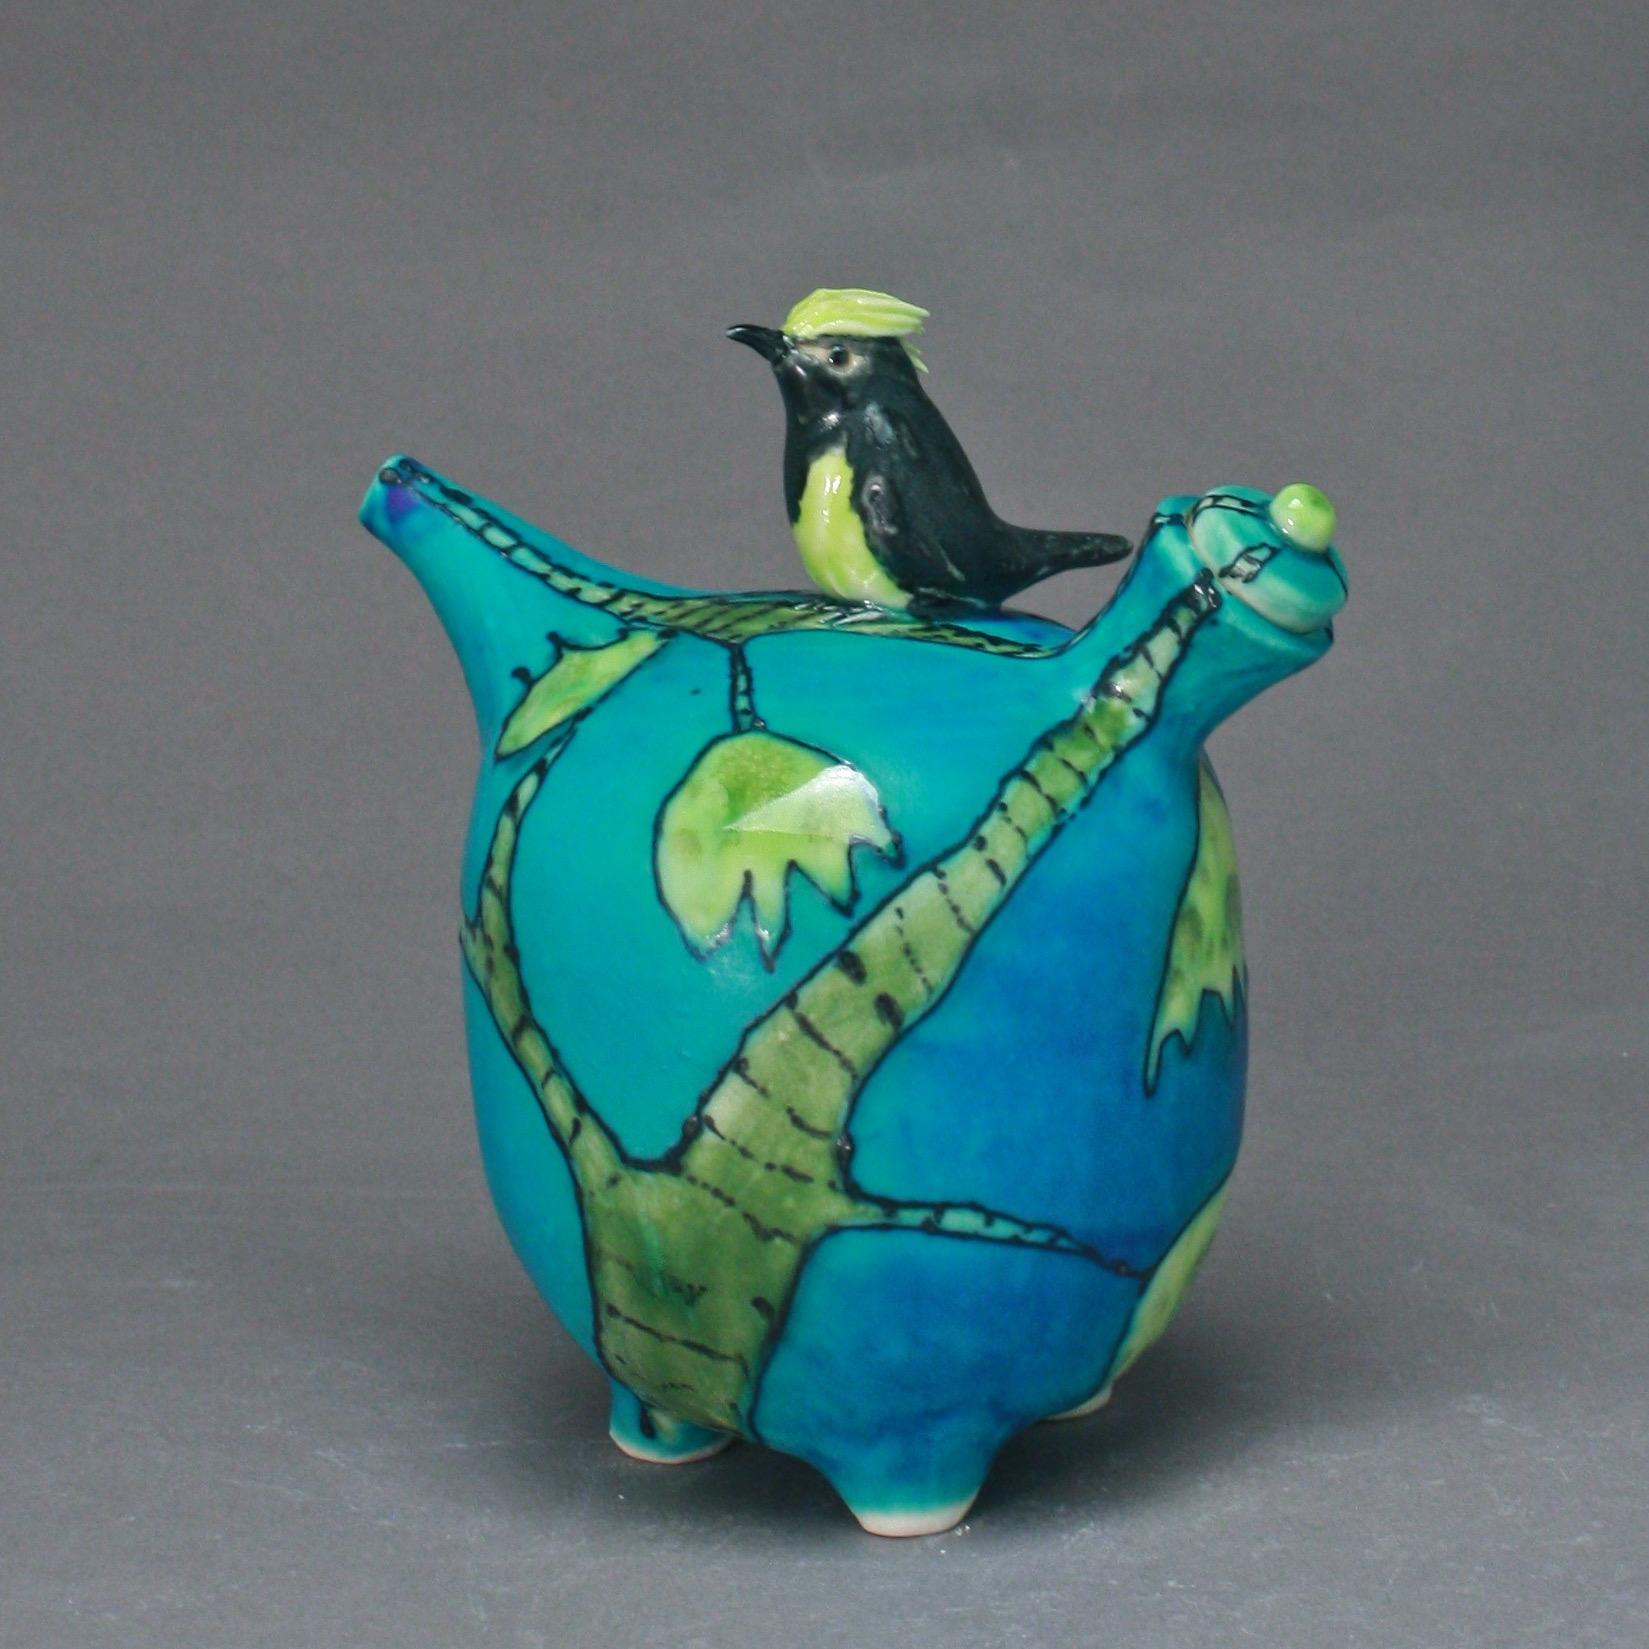 OC-22 | Turquoise Oil Cruet with Sultan Tit ($160)